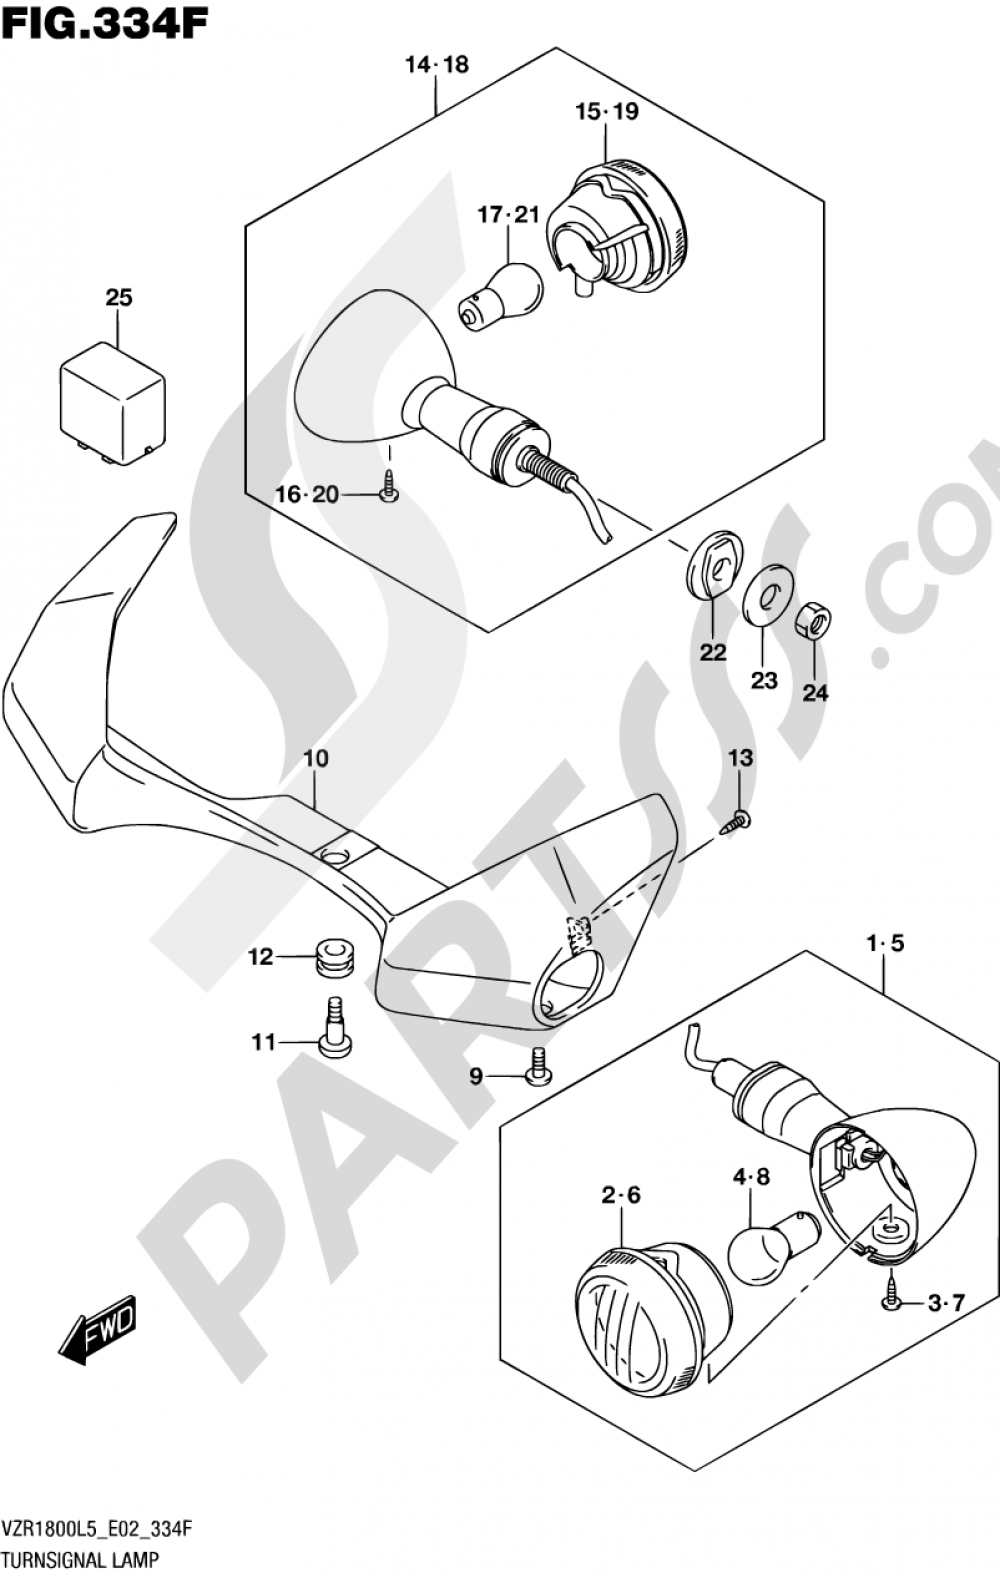 334F - TURNSIGNAL LAMP (VZR1800BZUFL5 E19) Suzuki VZR1800BZ 2015